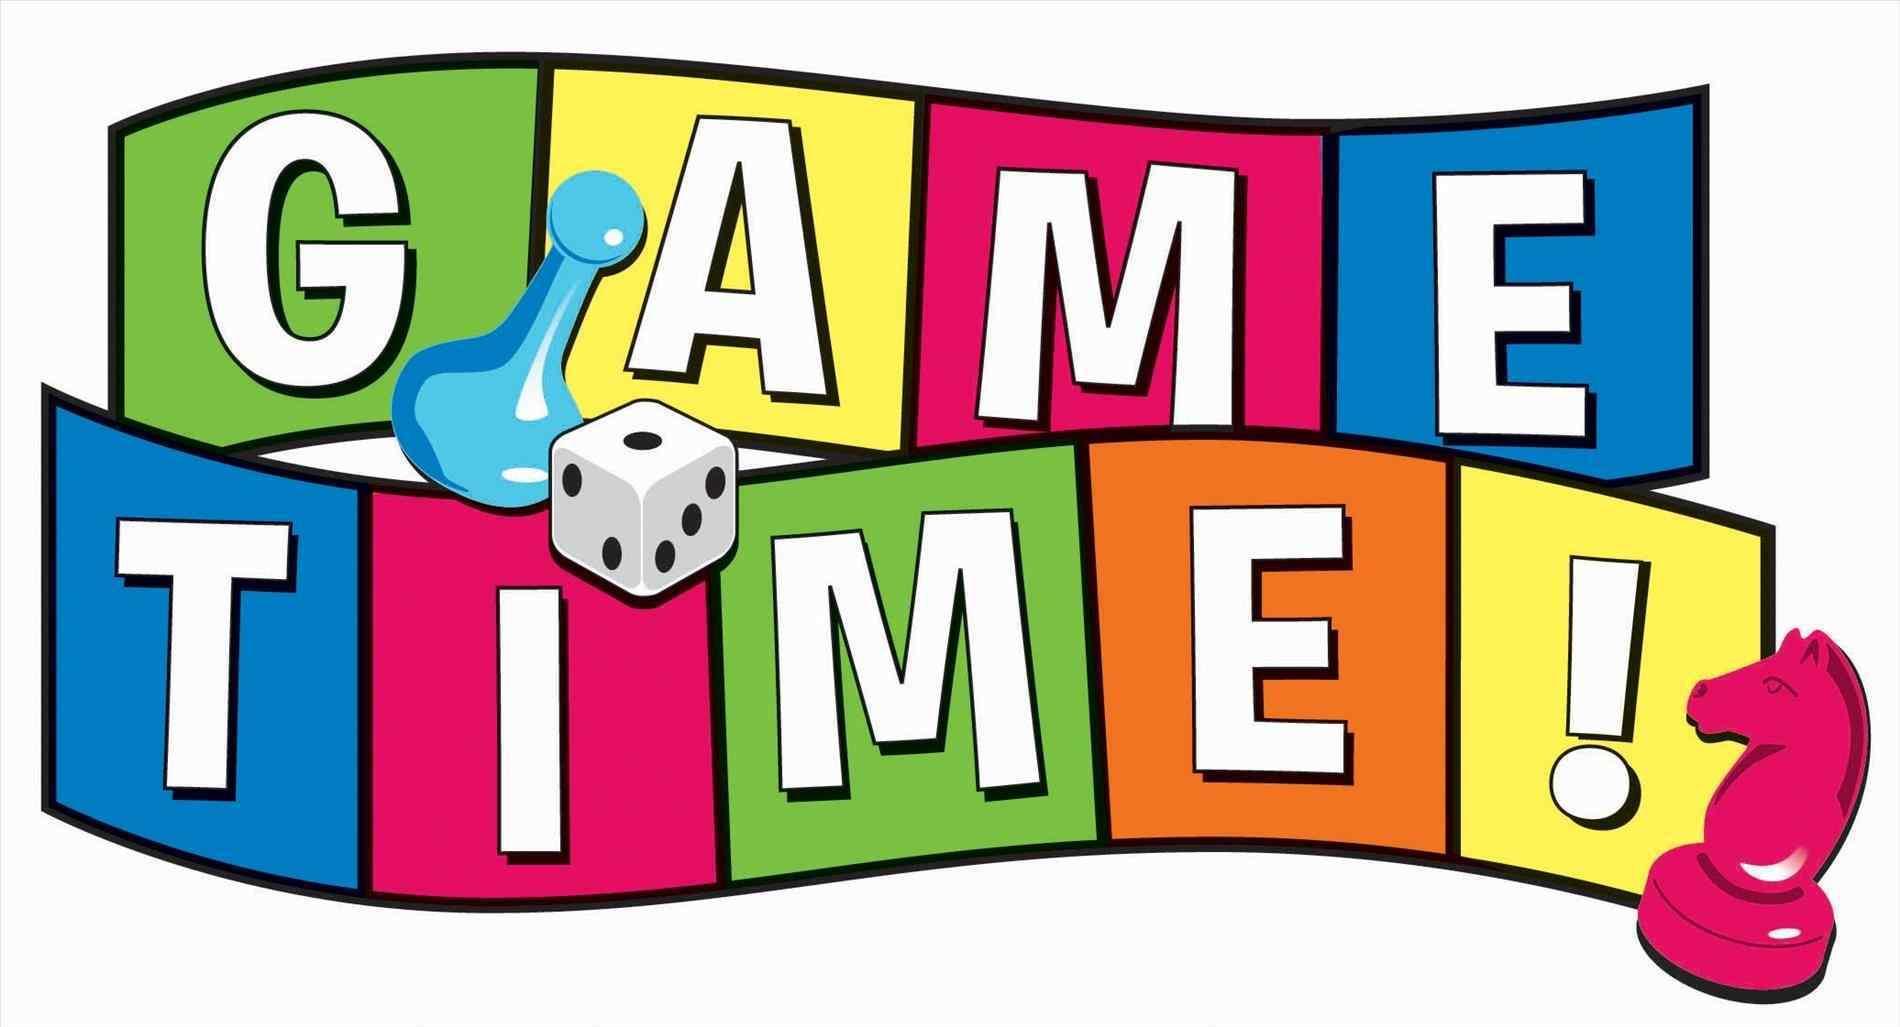 Game clipart. Games jokingart com